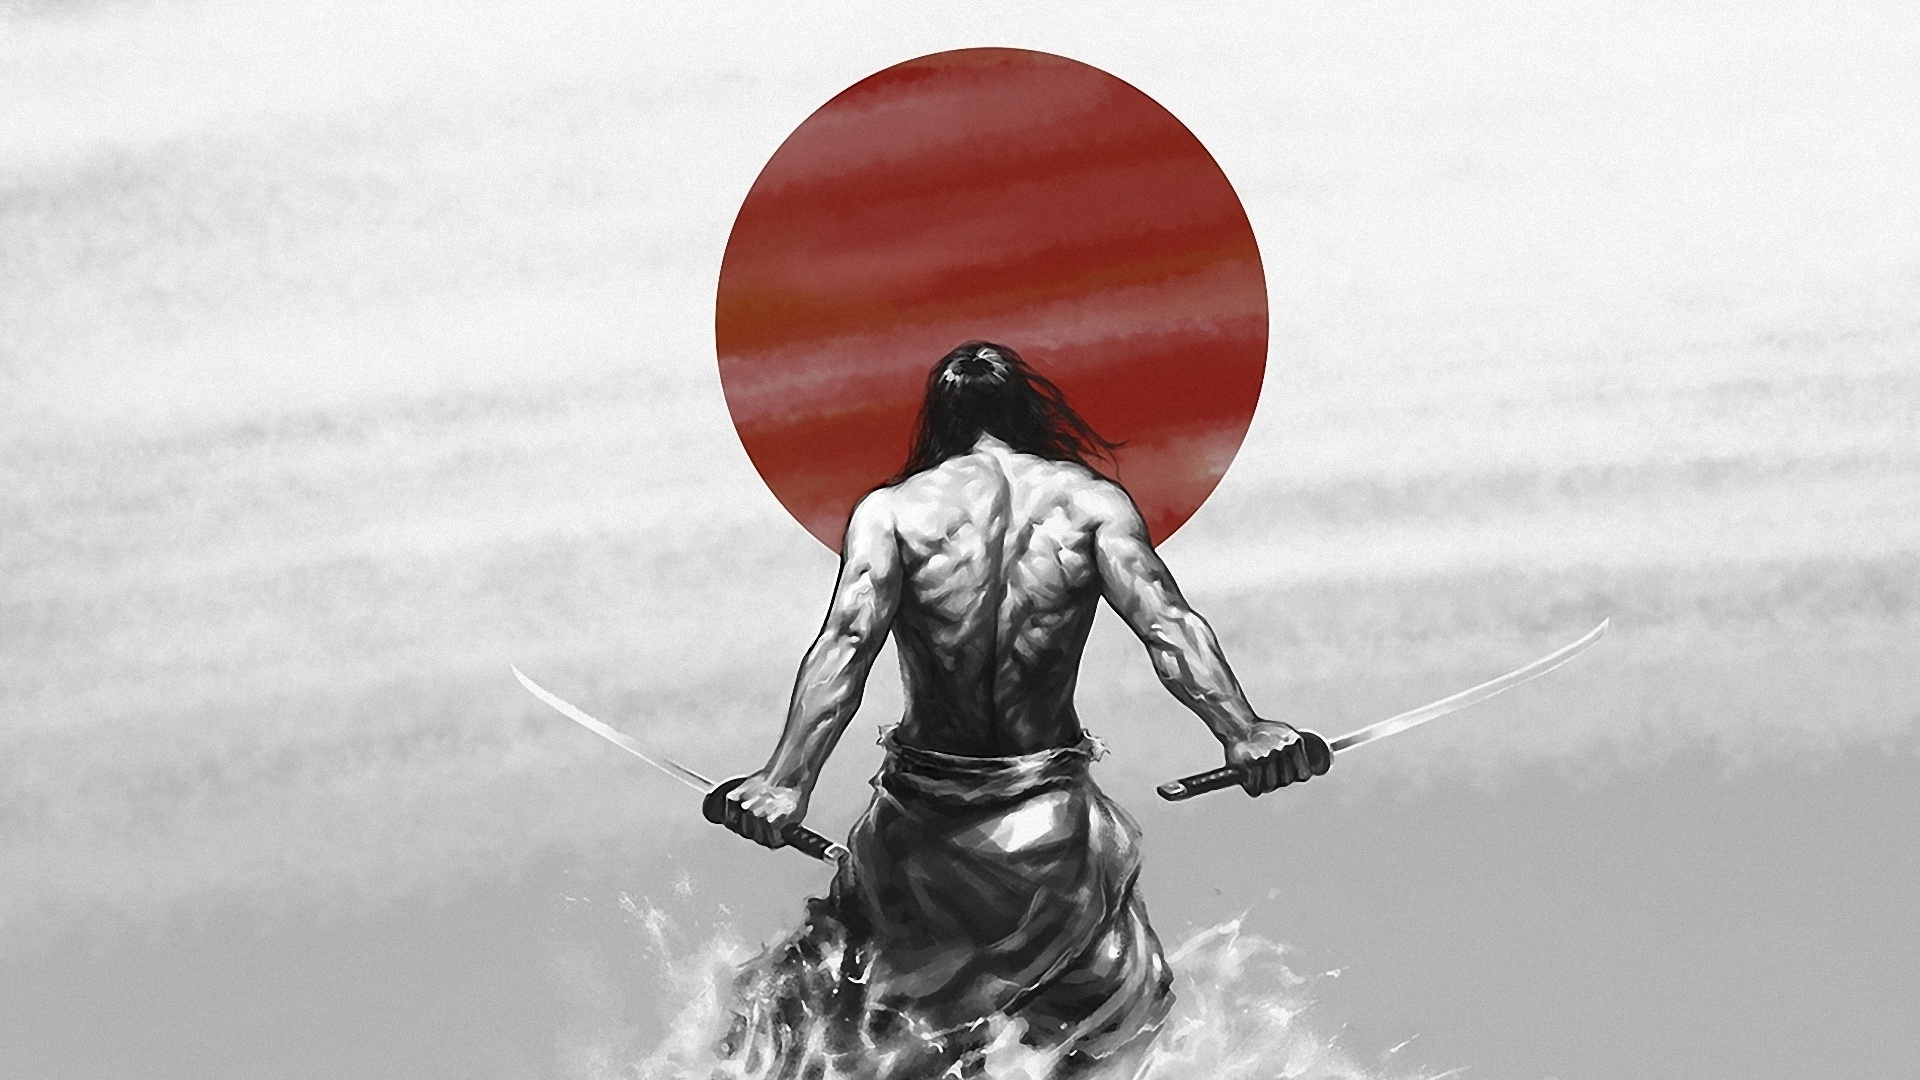 Samurai fantasy wallpaper | 1920x1080 | 28493 | WallpaperUP